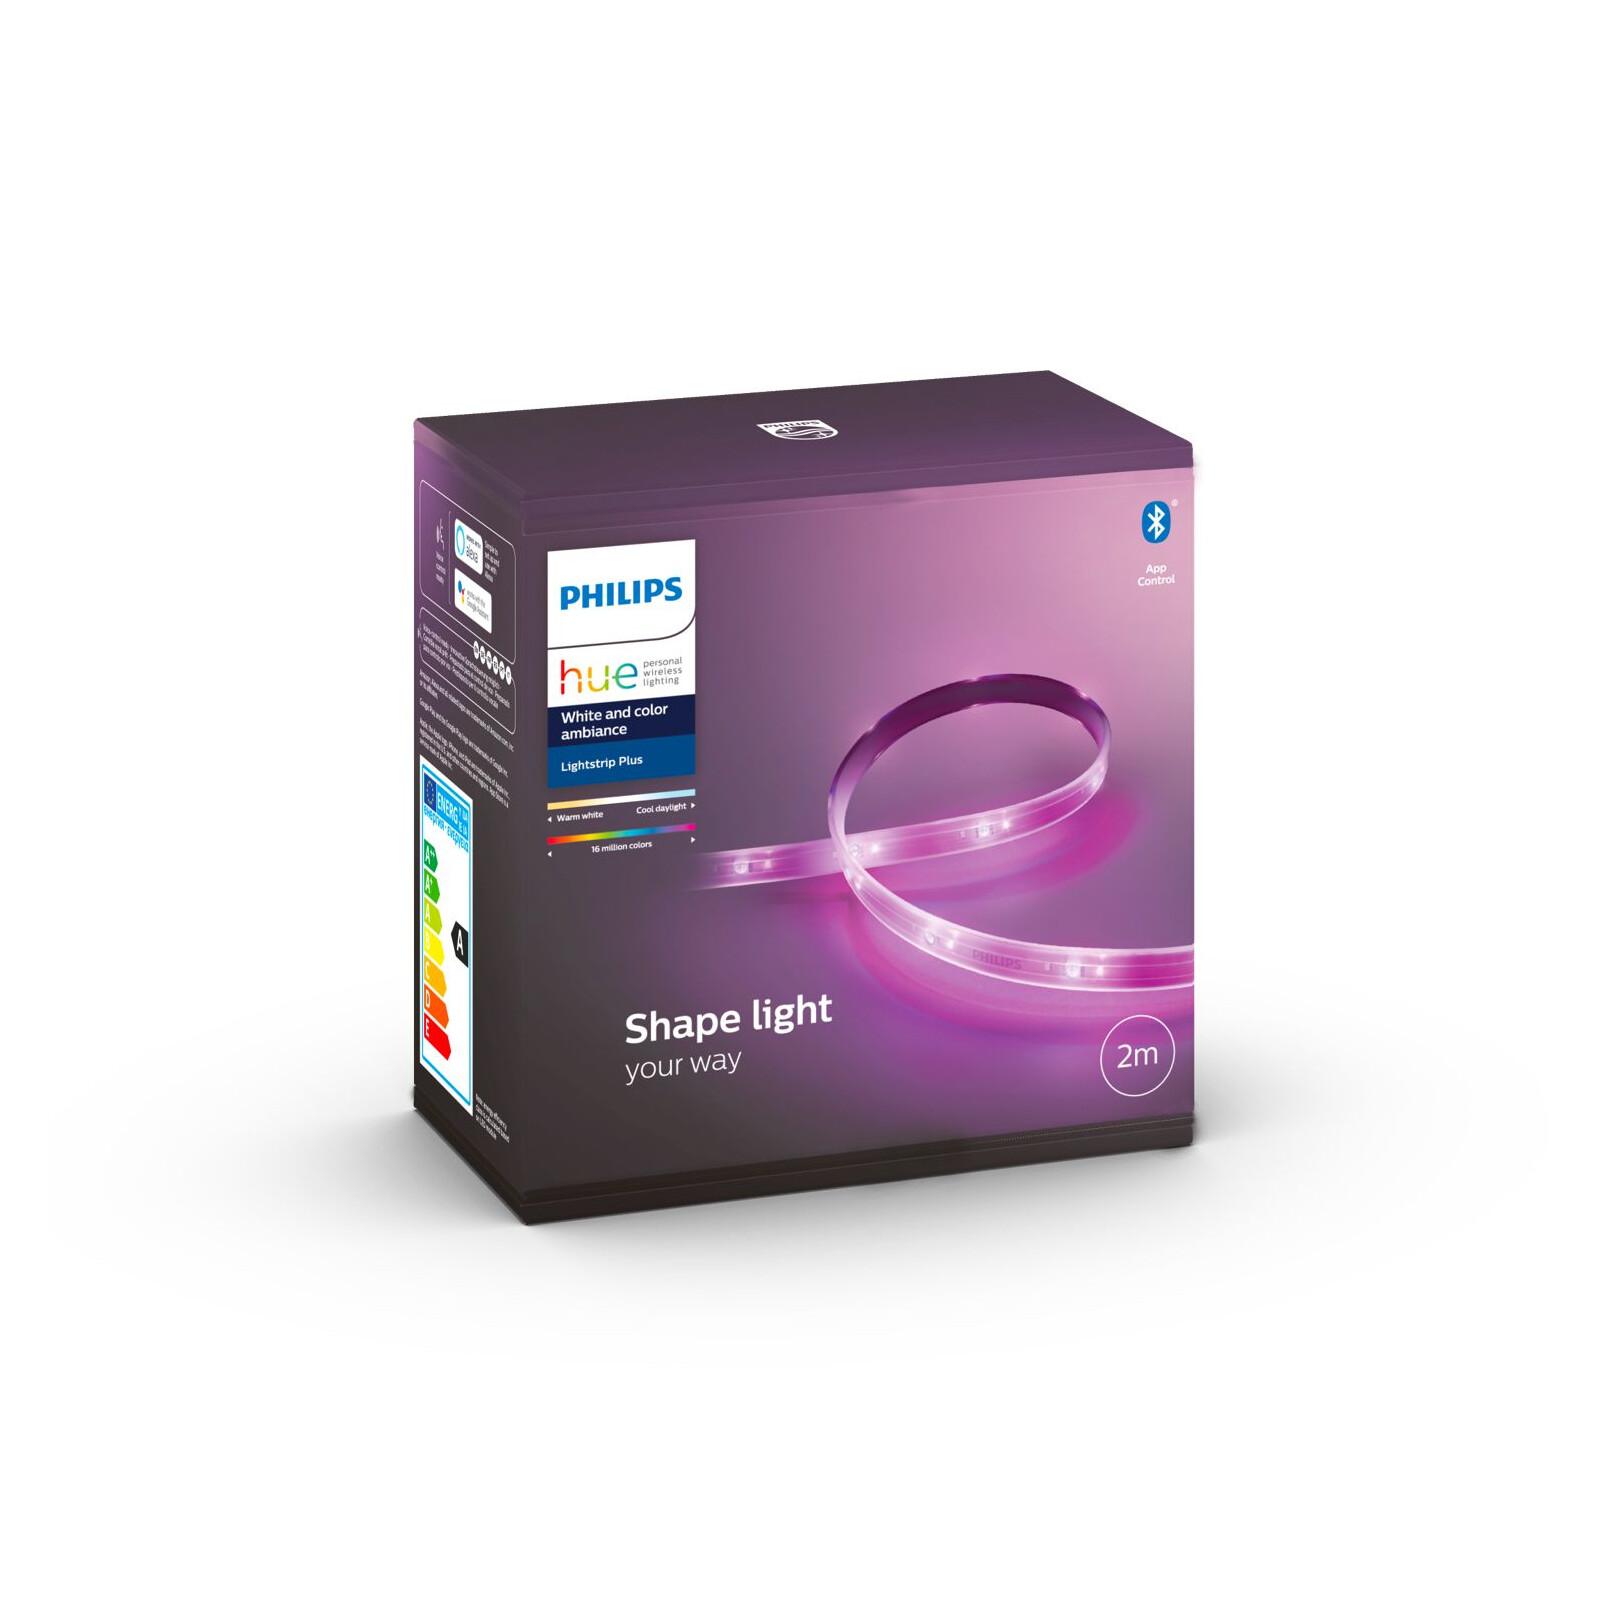 Beleuchtung Philips Hue LightStrip Plus Basis 2m RGBW 1600lm V4